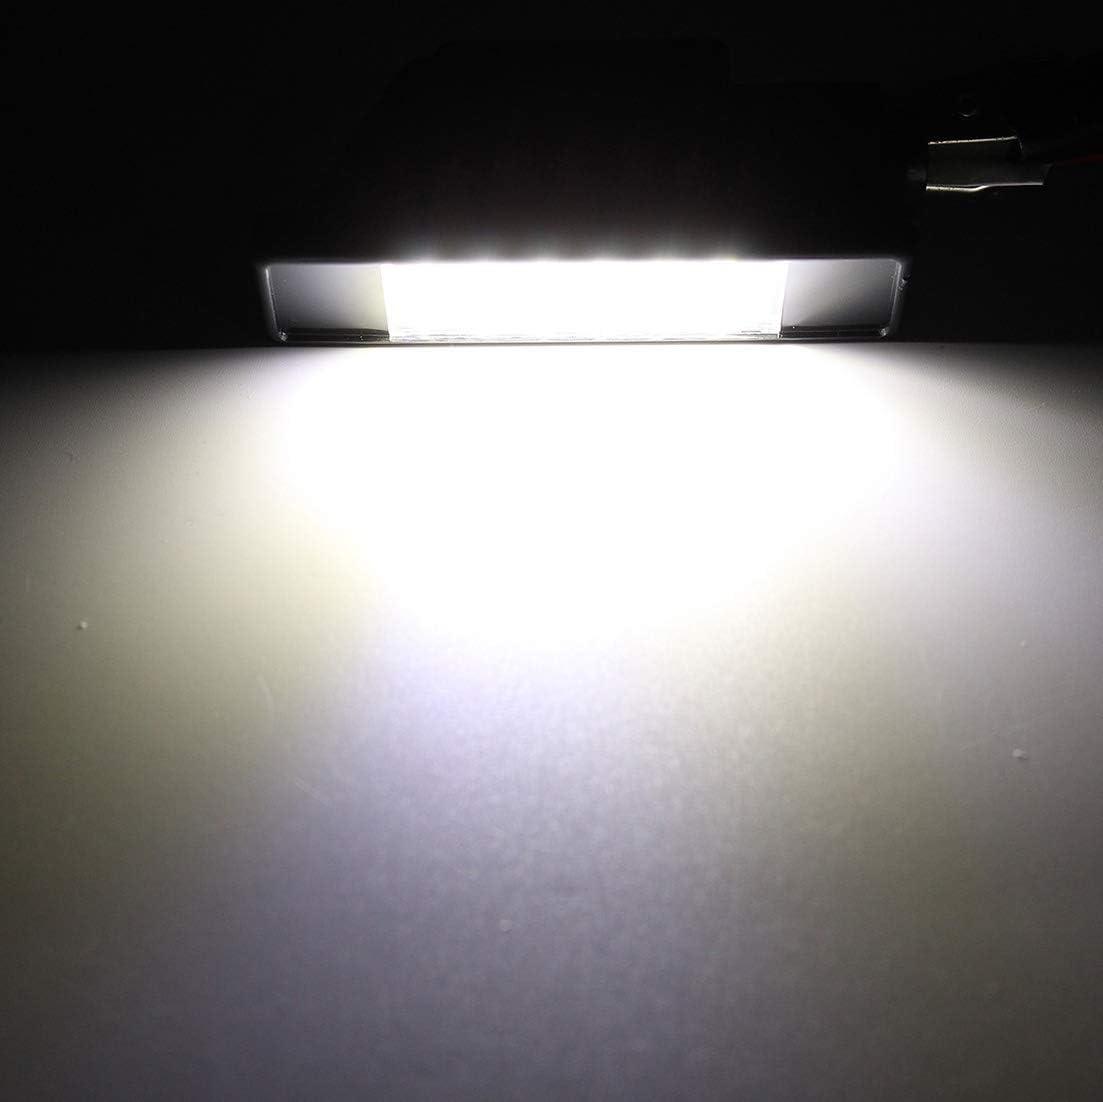 MOLEAQI 2 St/ück 18 LED Perlen Kennzeichen LED Lichtleuchte f/ür C-Citroen C2 C3 C4 C5 C6 DS3 f/ür Peugeot 106 207 307 308 406 407 508 1007 3008